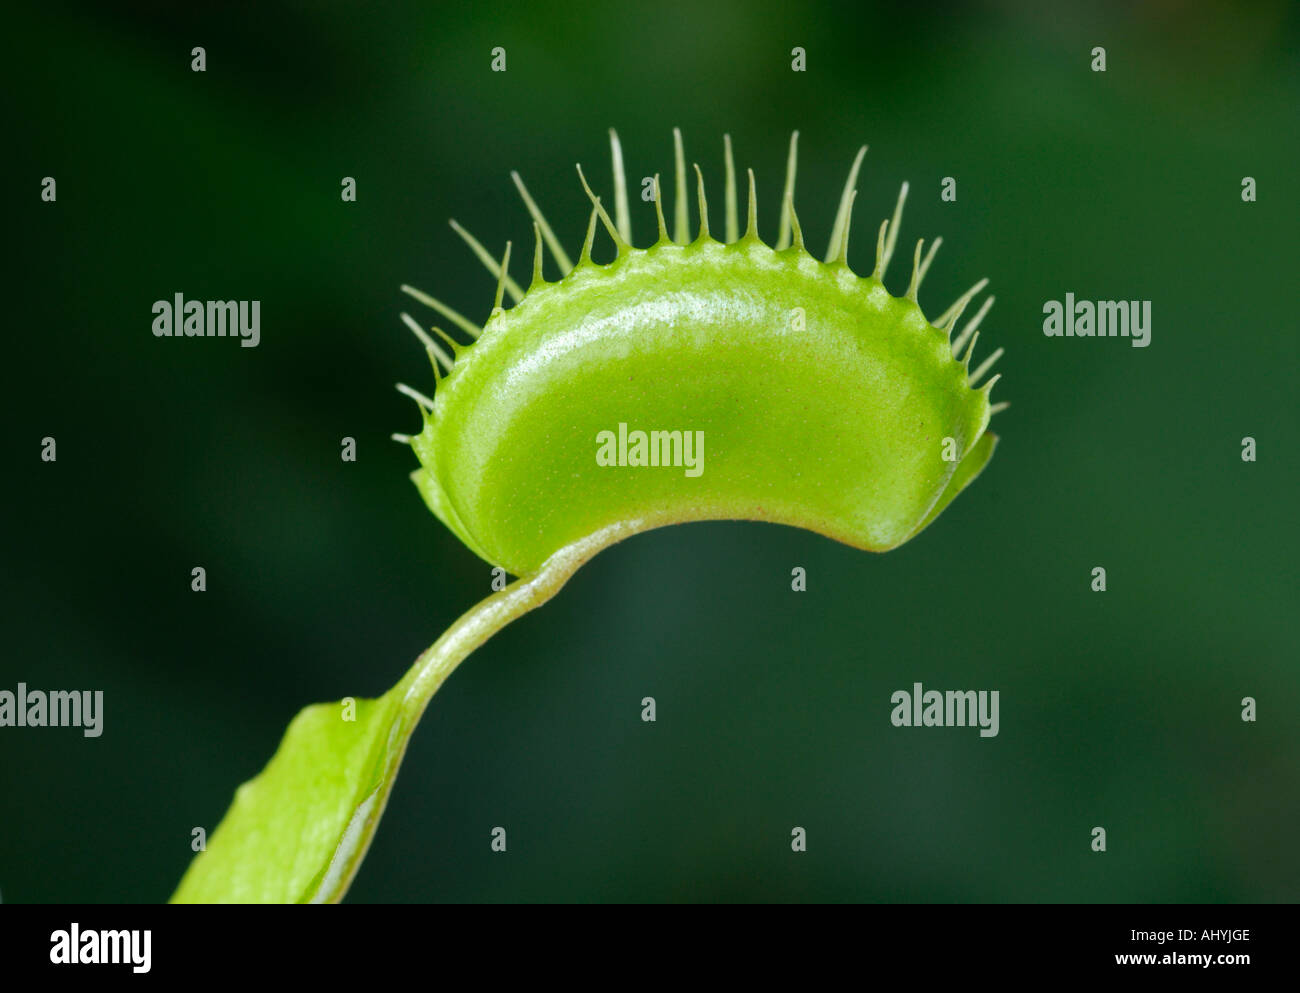 Venus flytrap, Dionaea muscipula - Stock Image